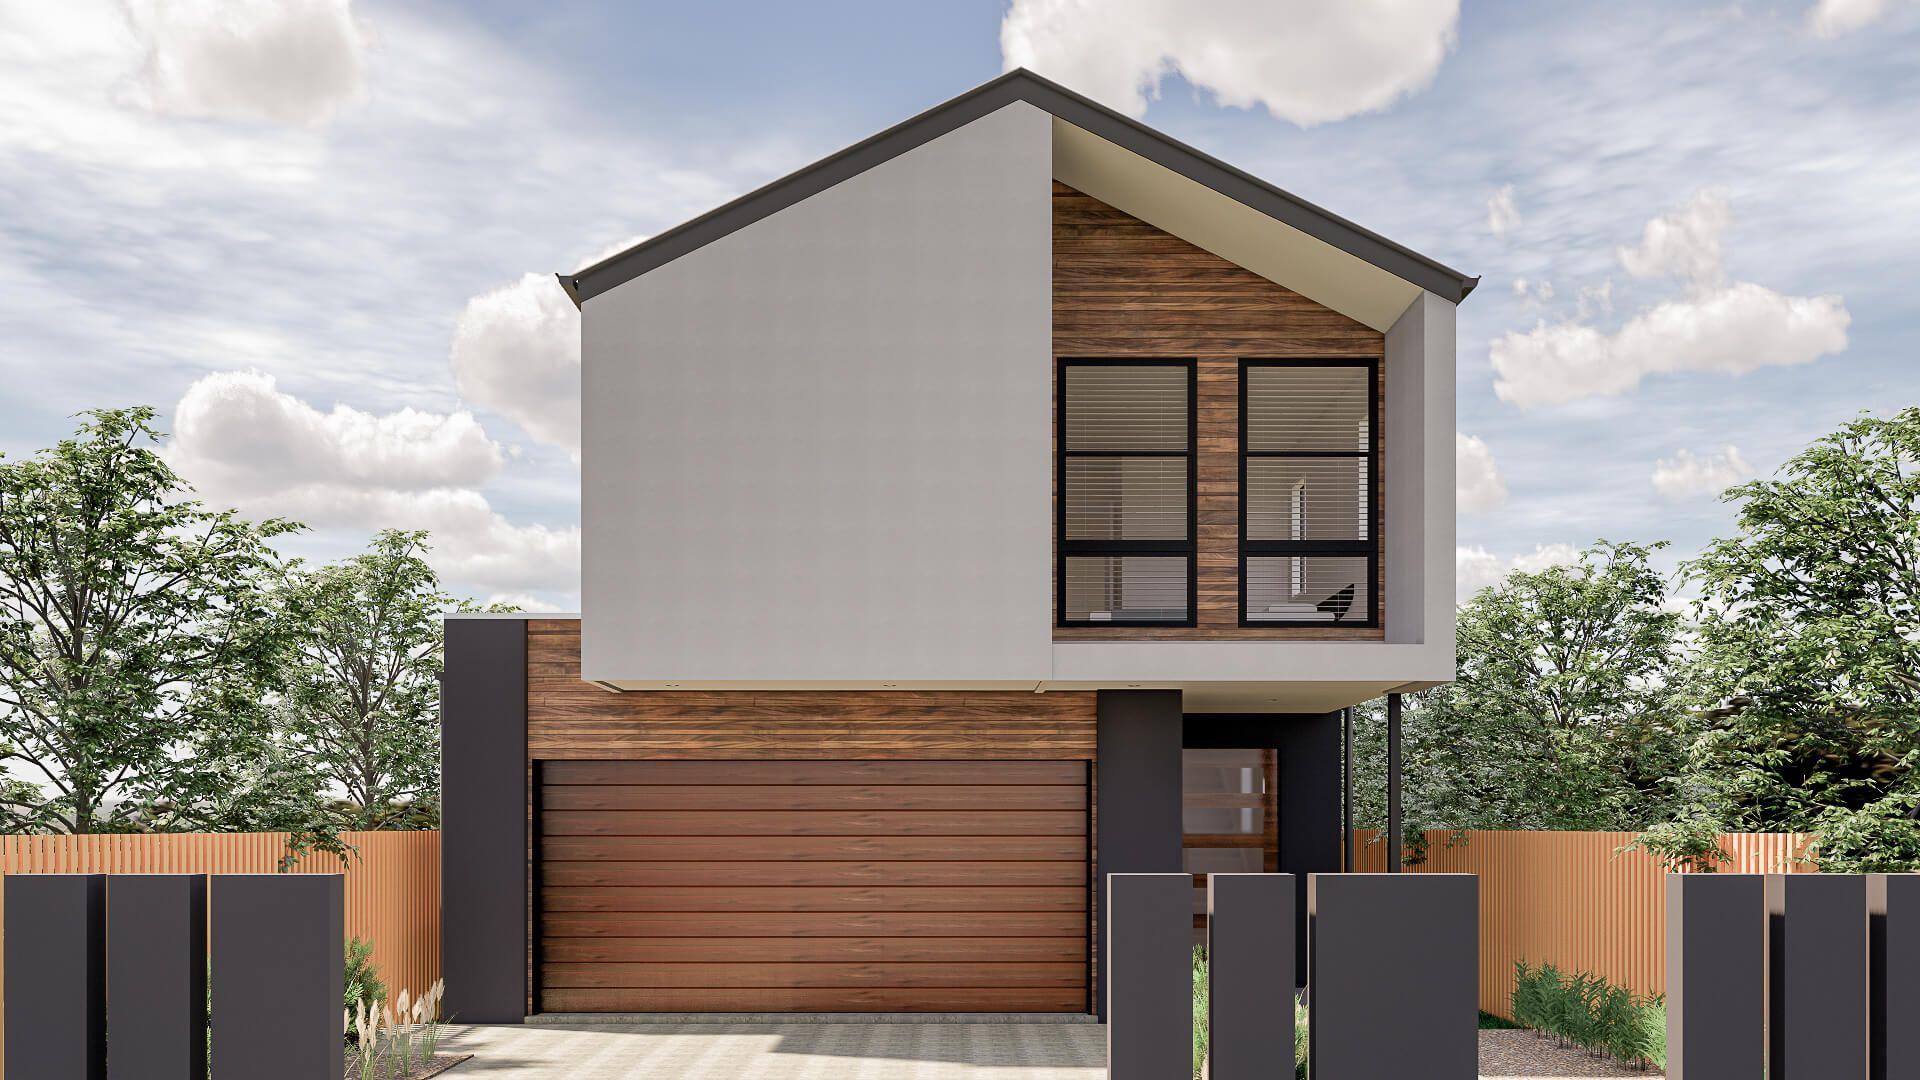 New Modern Facade In 2020 Home Builders Floor Plans City Living